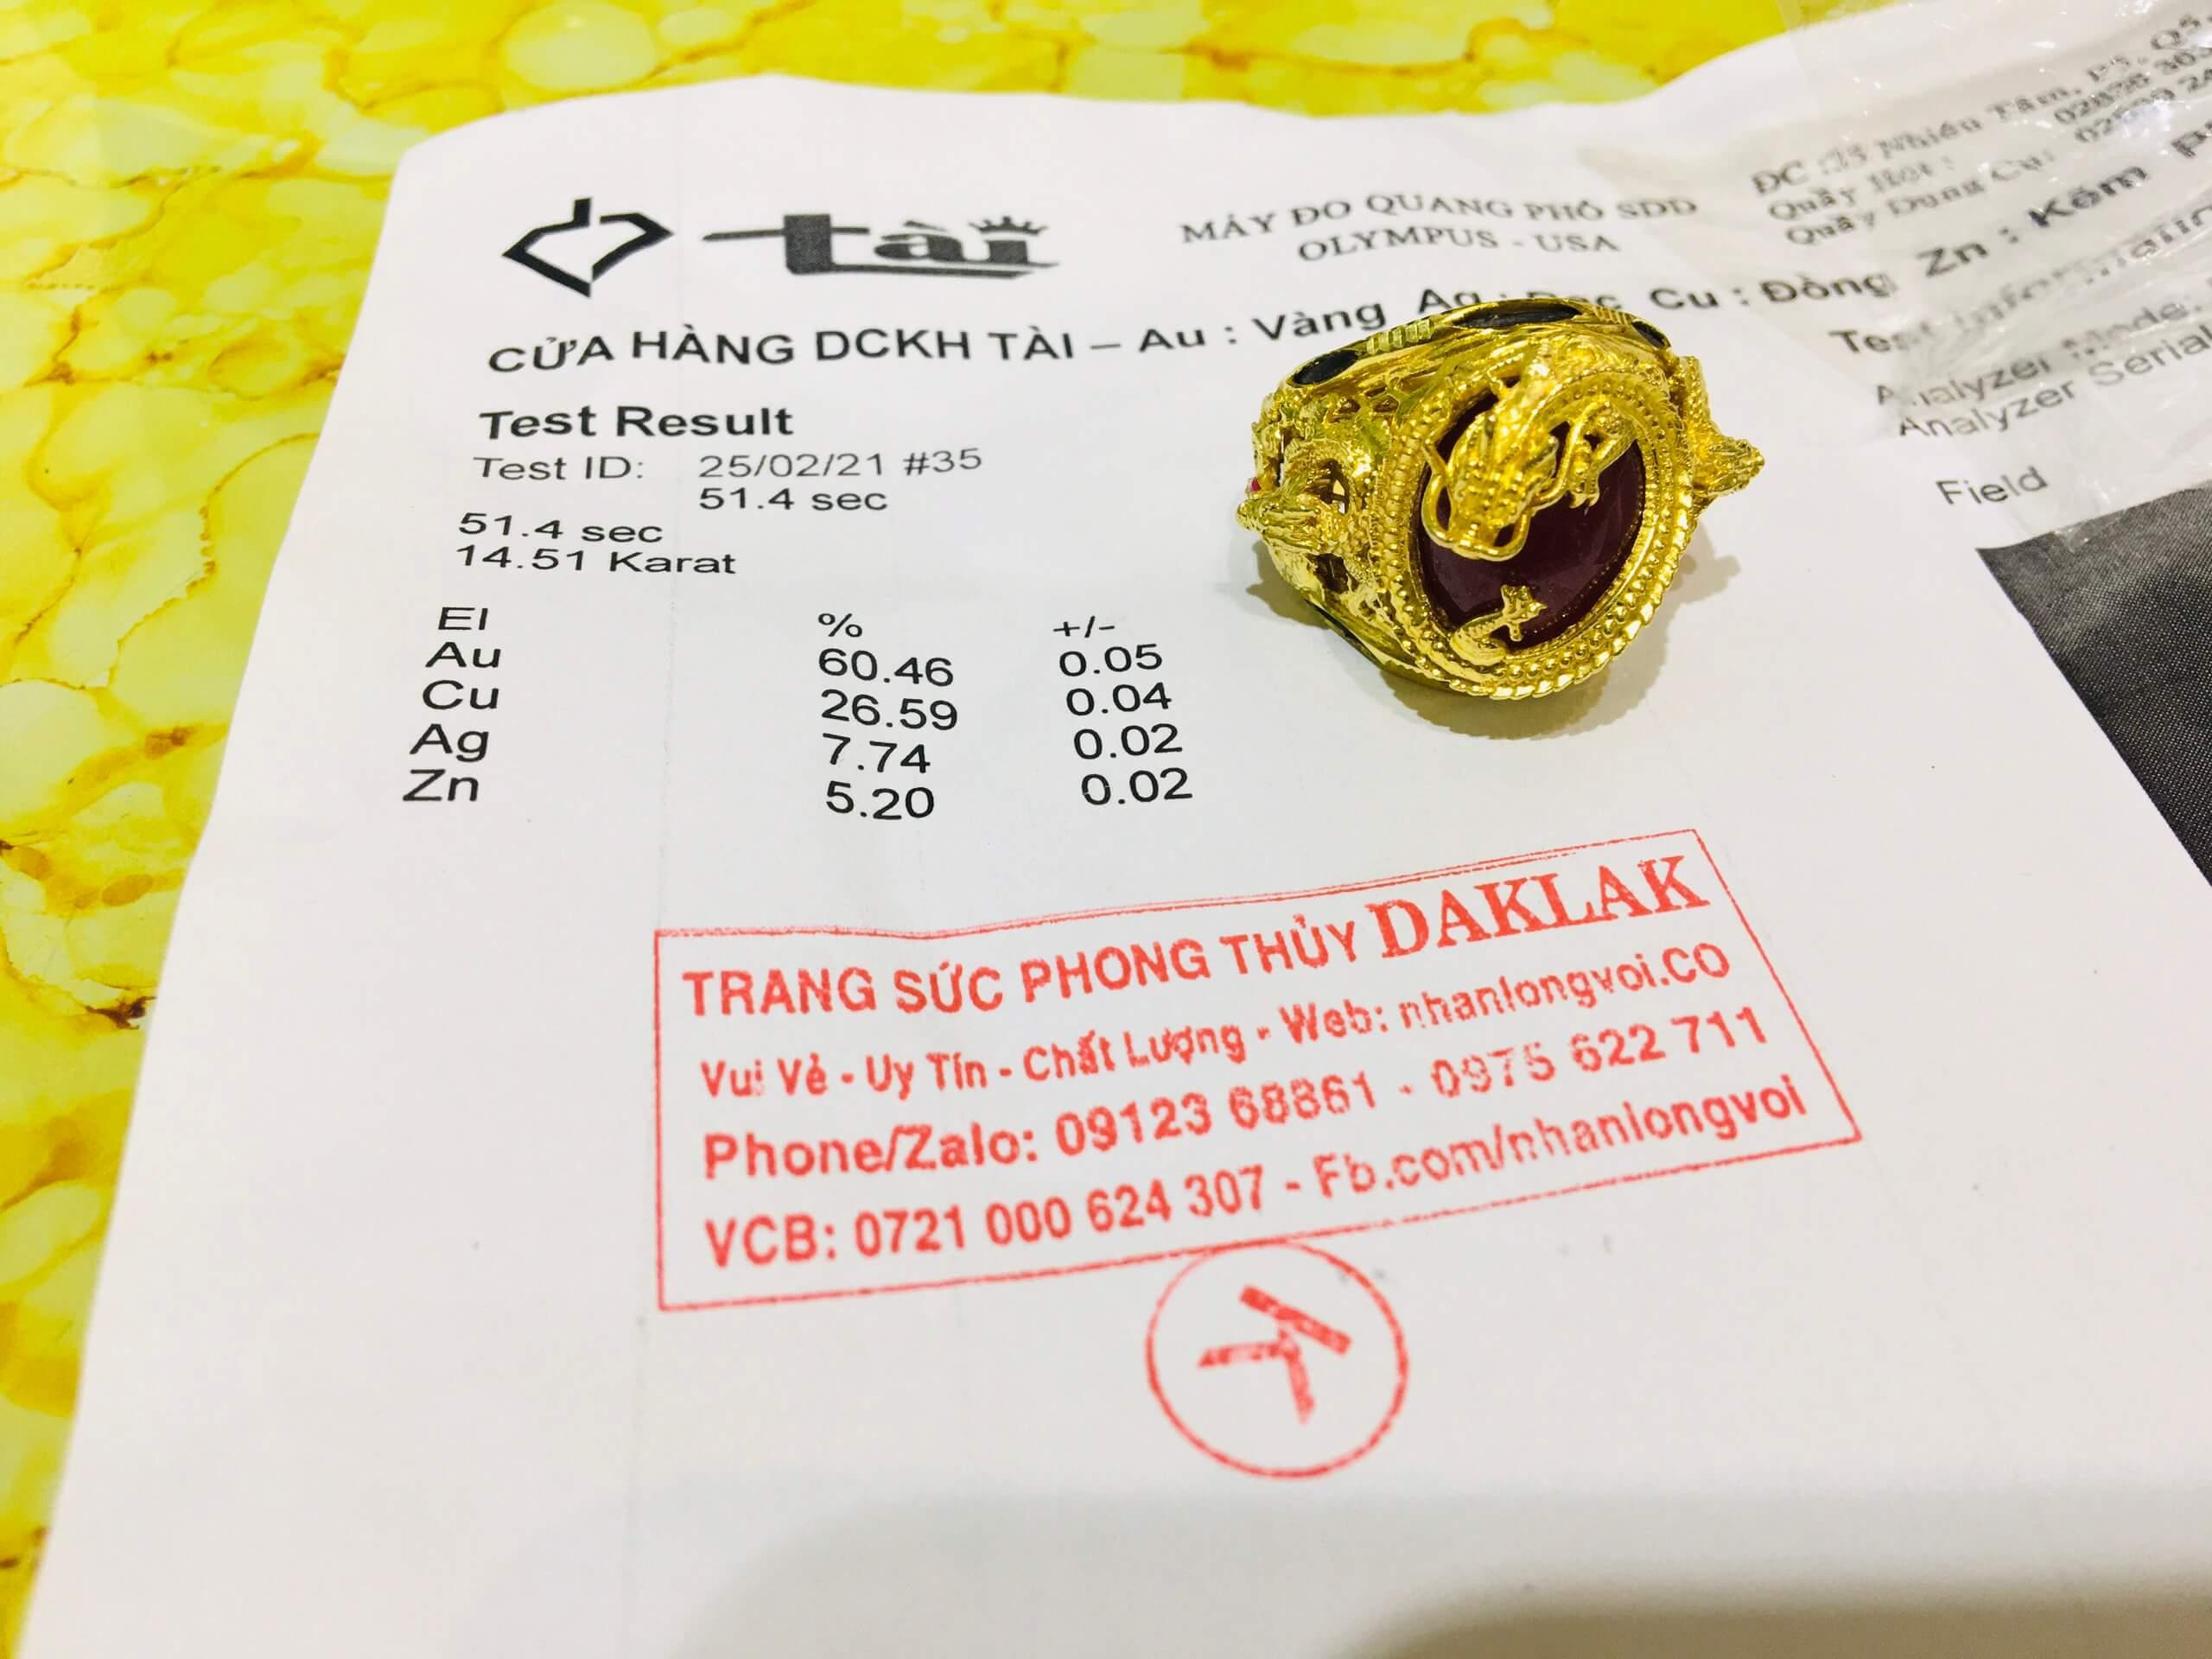 nhan-rong-cuon-vang-ngam-ngoc-ruby-luong-2-soi-long-voi-riogems